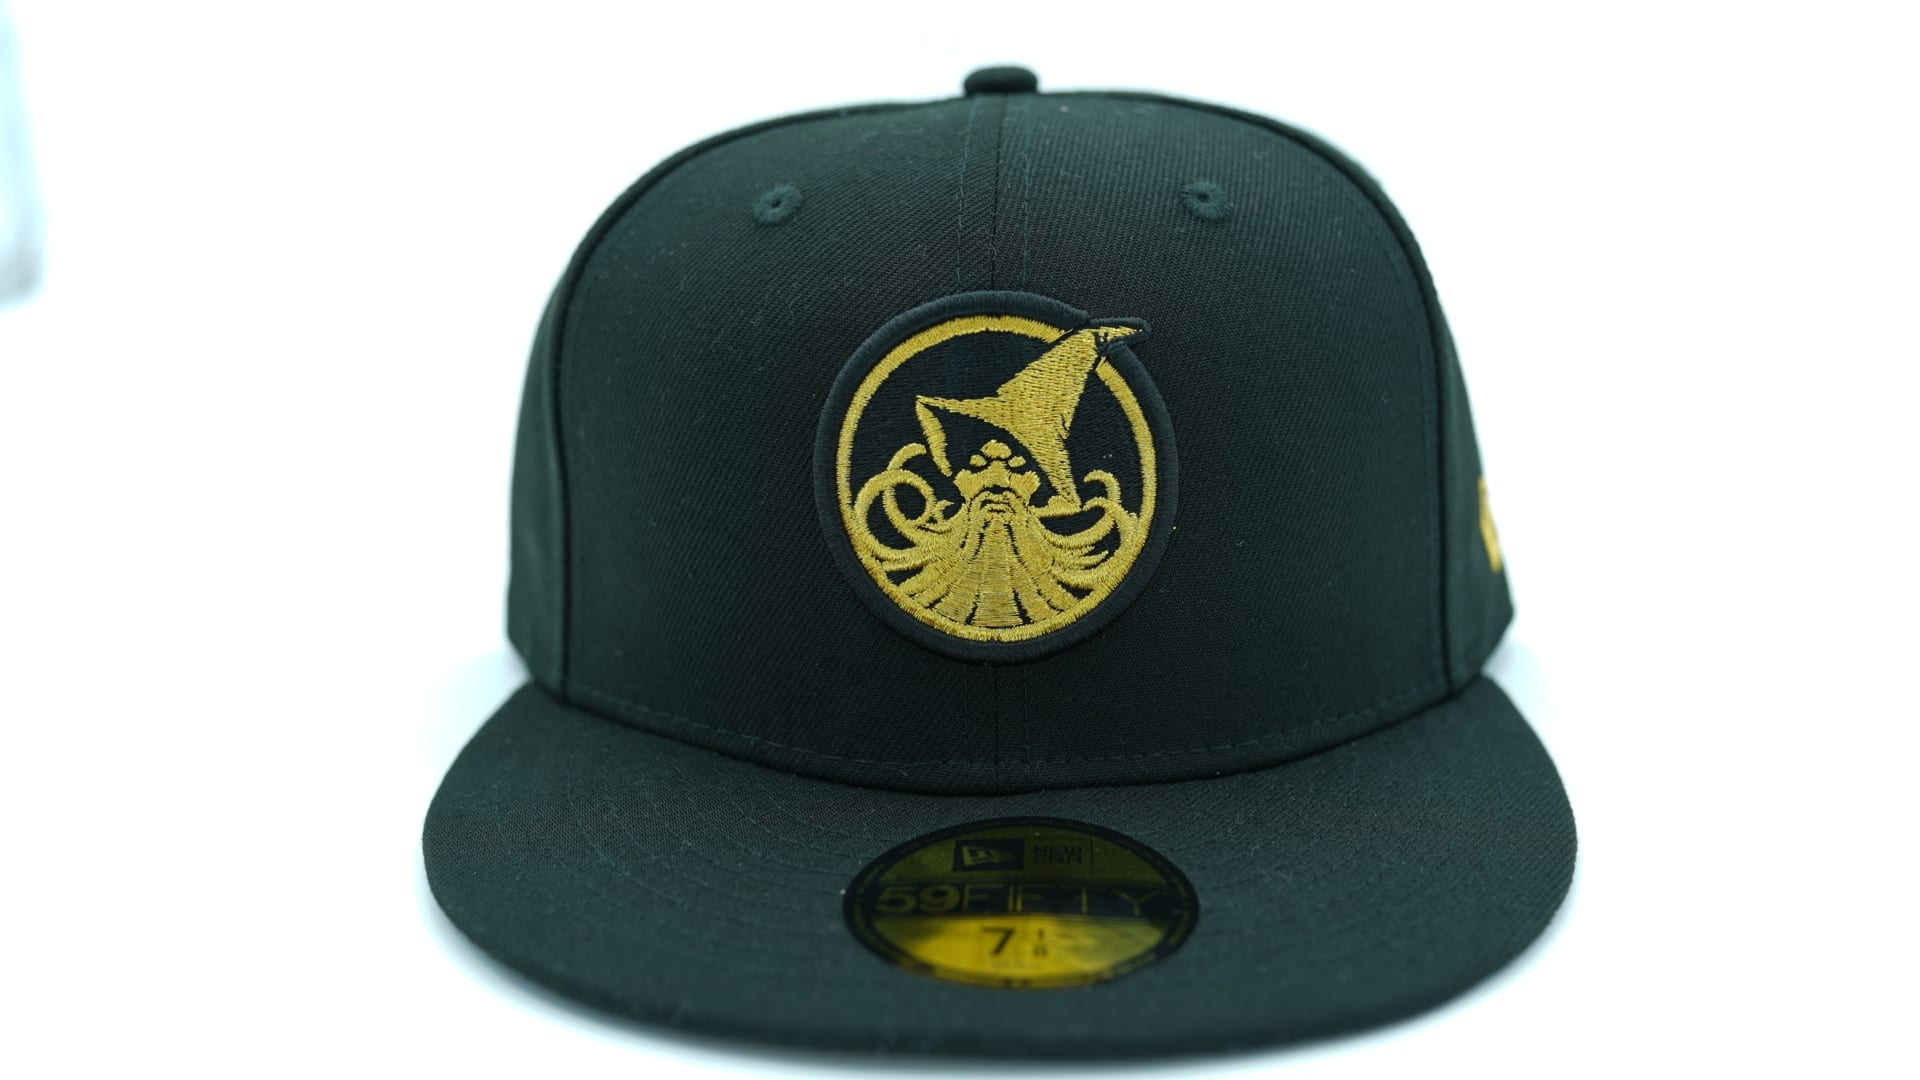 90ebb199 new era hat,new era snapback hats,new era cap,new era 59fifty fitted ...